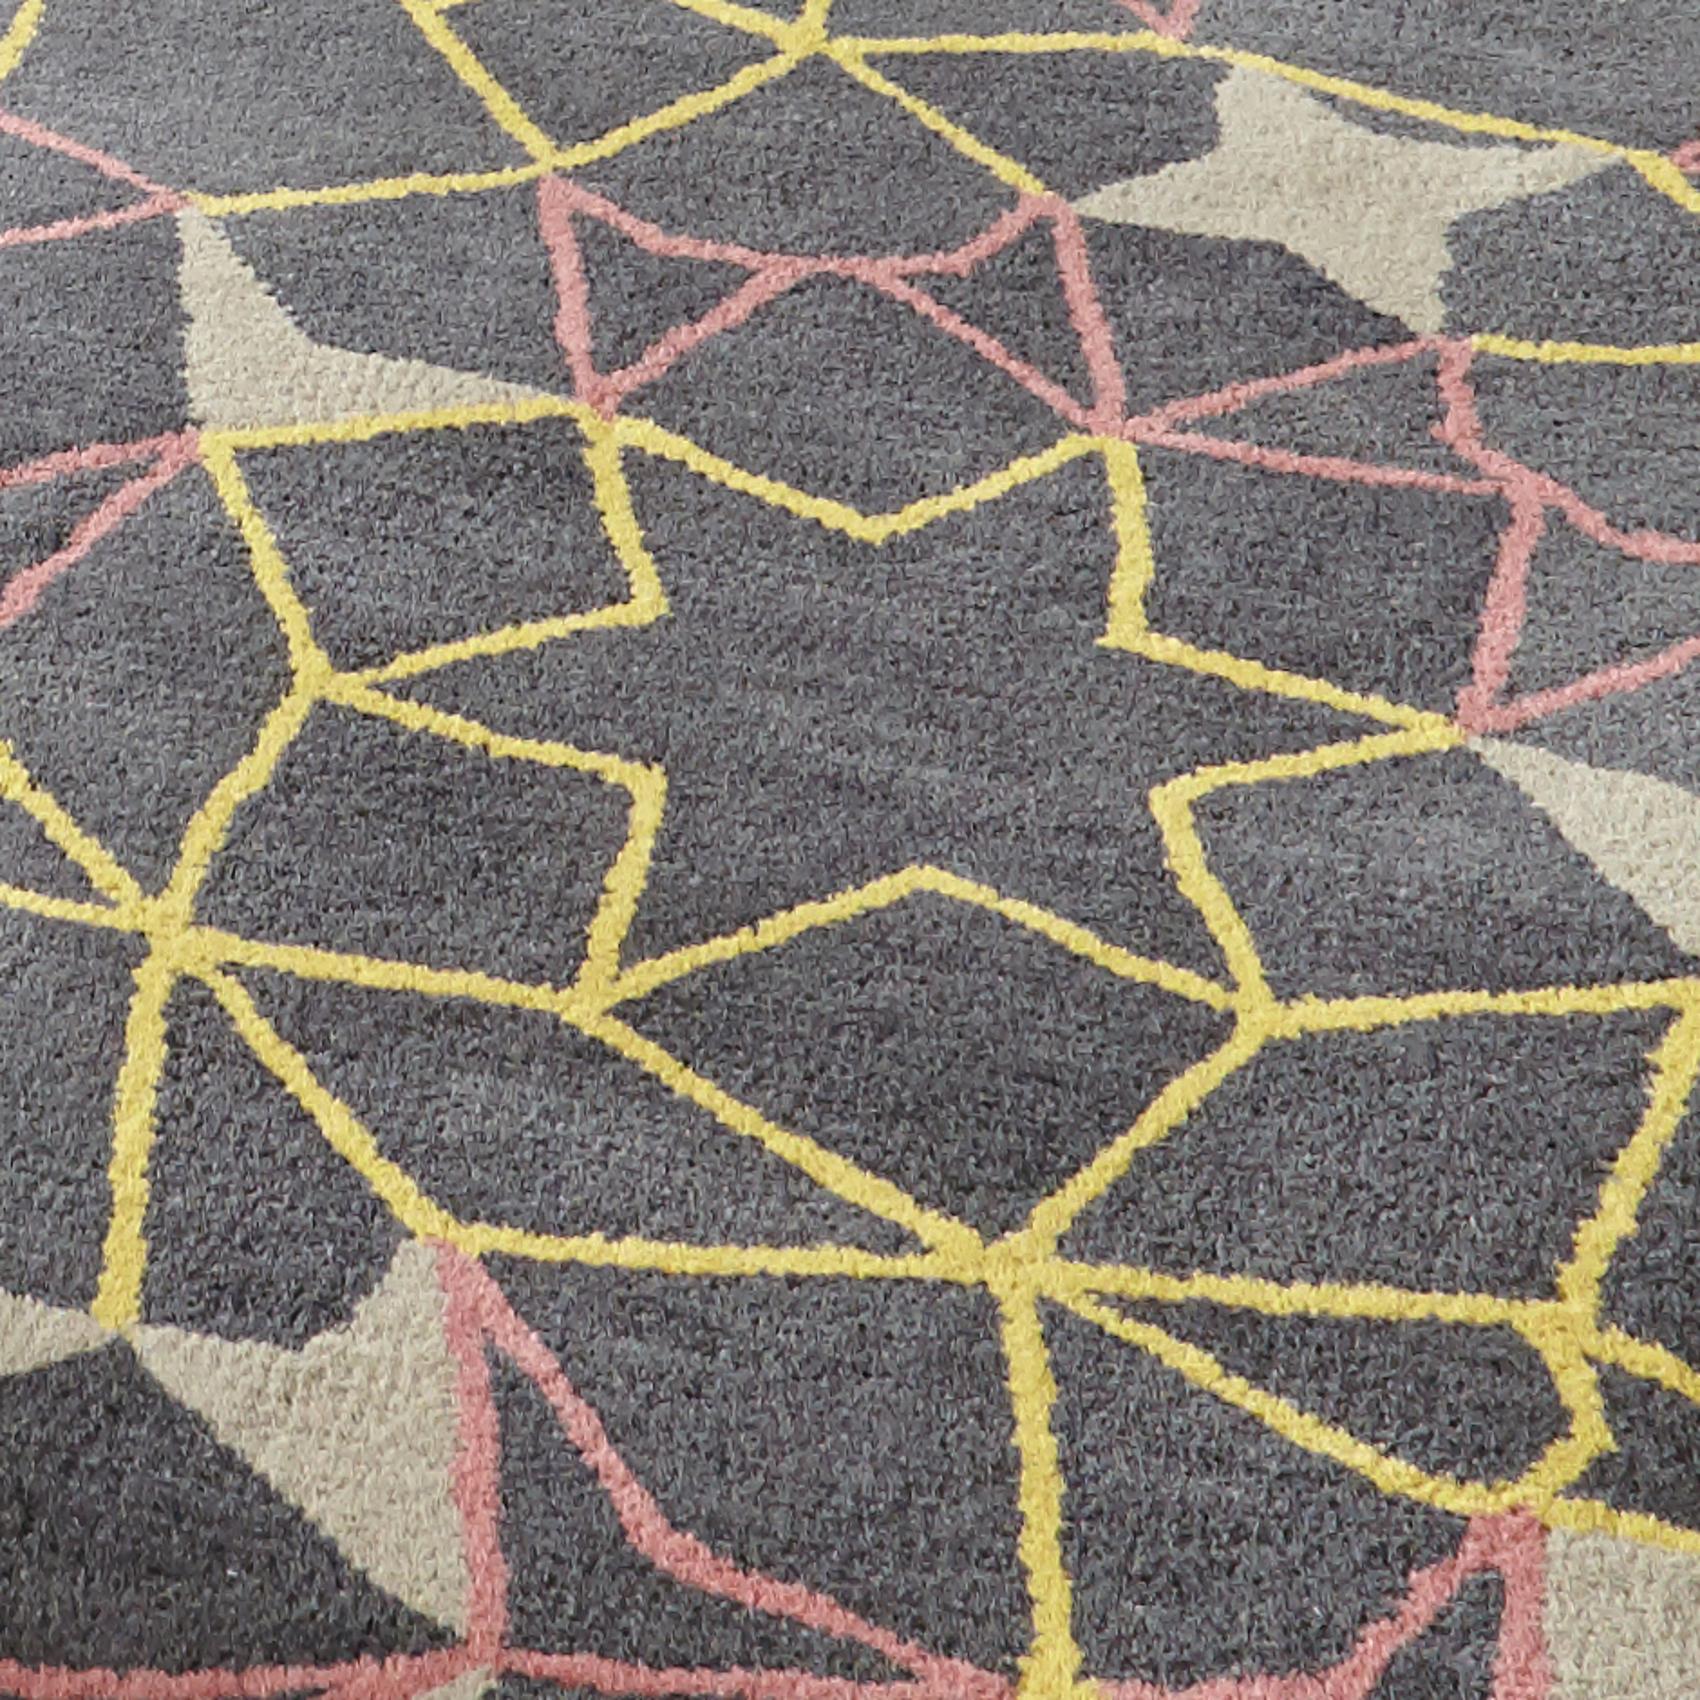 spectrum hand tufted arrows stars rug 100 wool modern. Black Bedroom Furniture Sets. Home Design Ideas